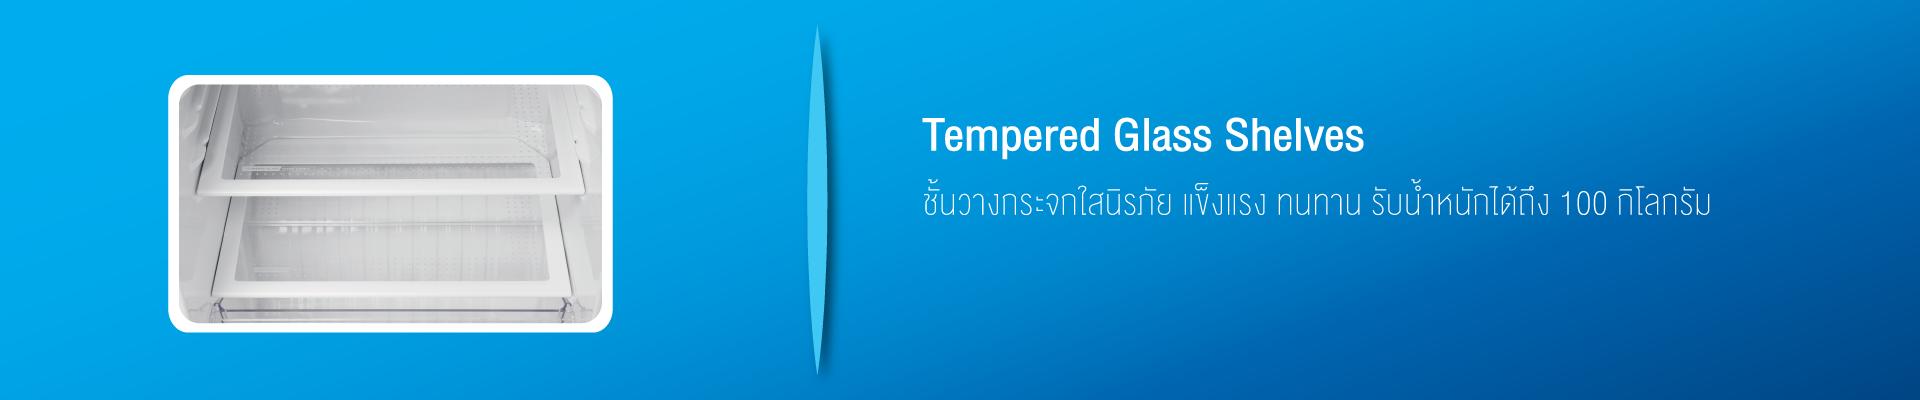 REF---website-spec-patern---1920x400-Tempered-Glass-Shelves.png